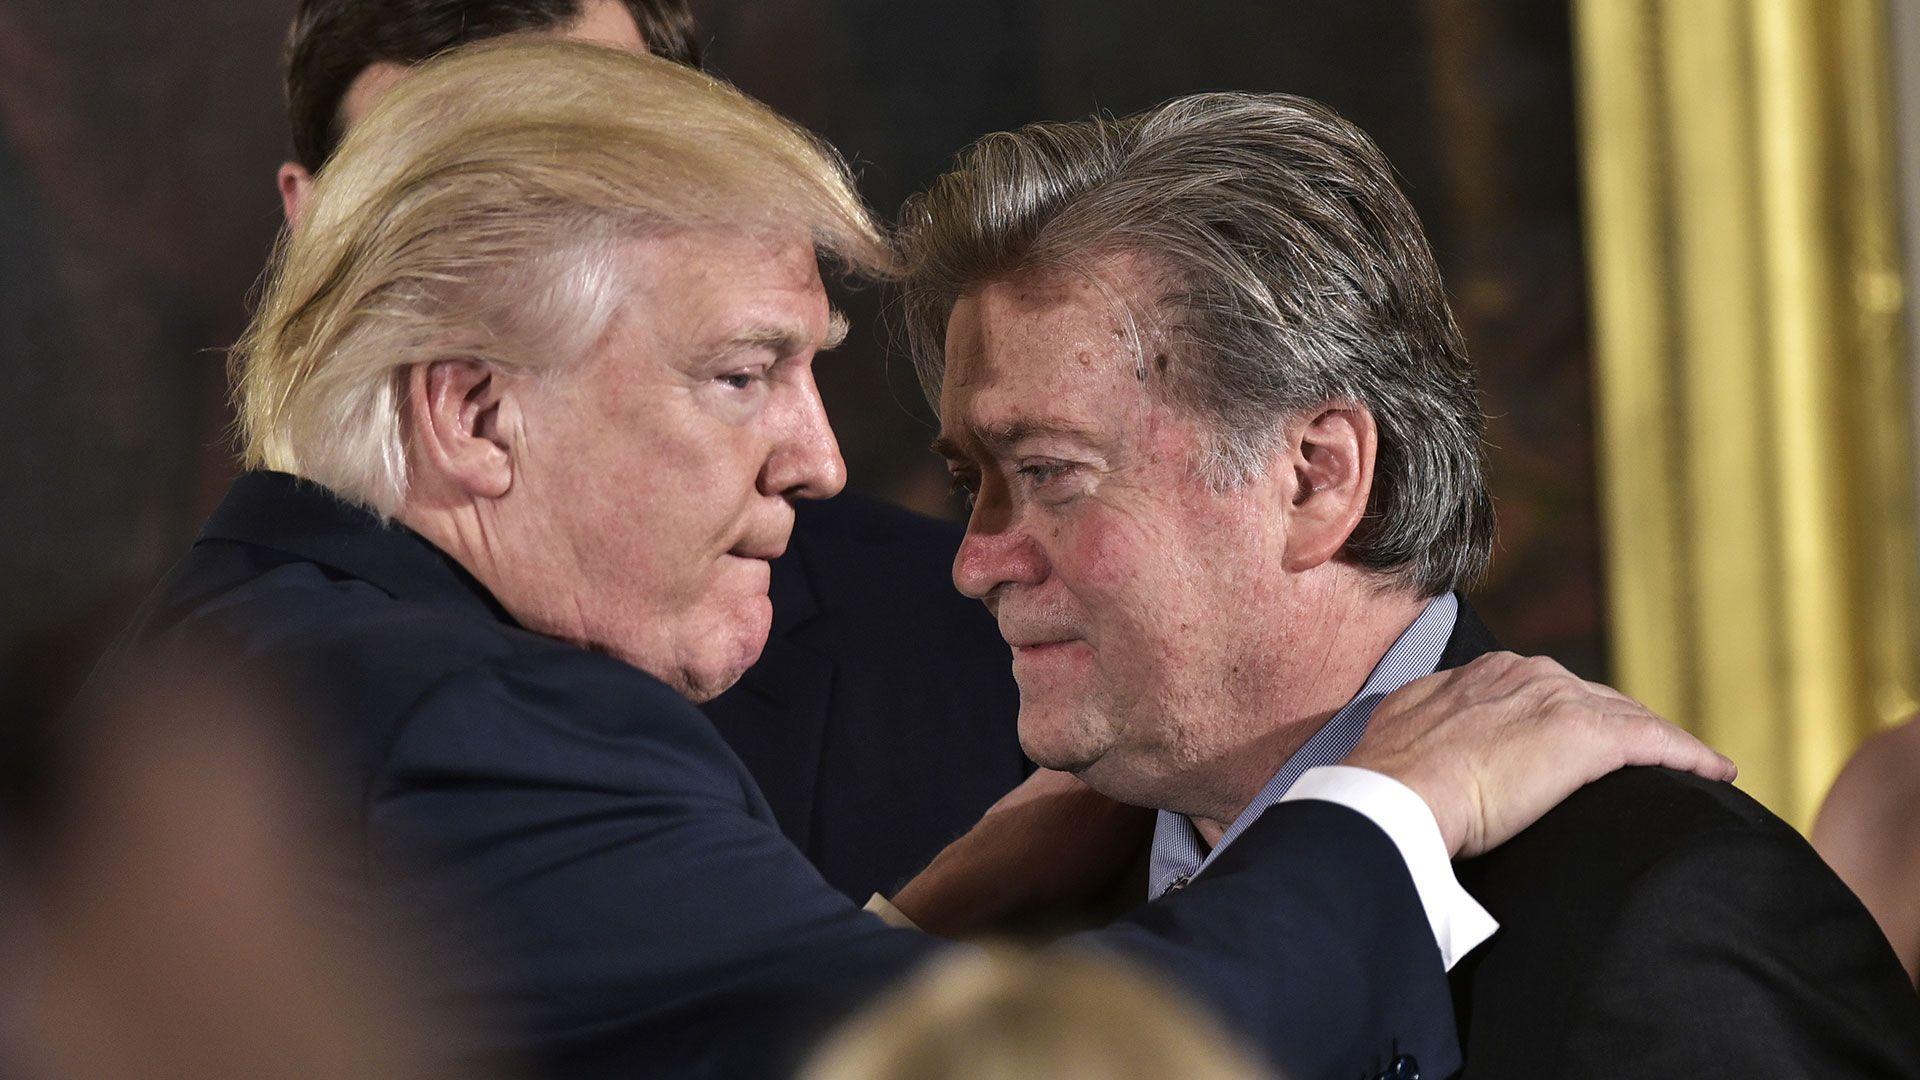 Steve Bannon integró el Consejo de Seguridad Nacional de Donald Trump (AFP)